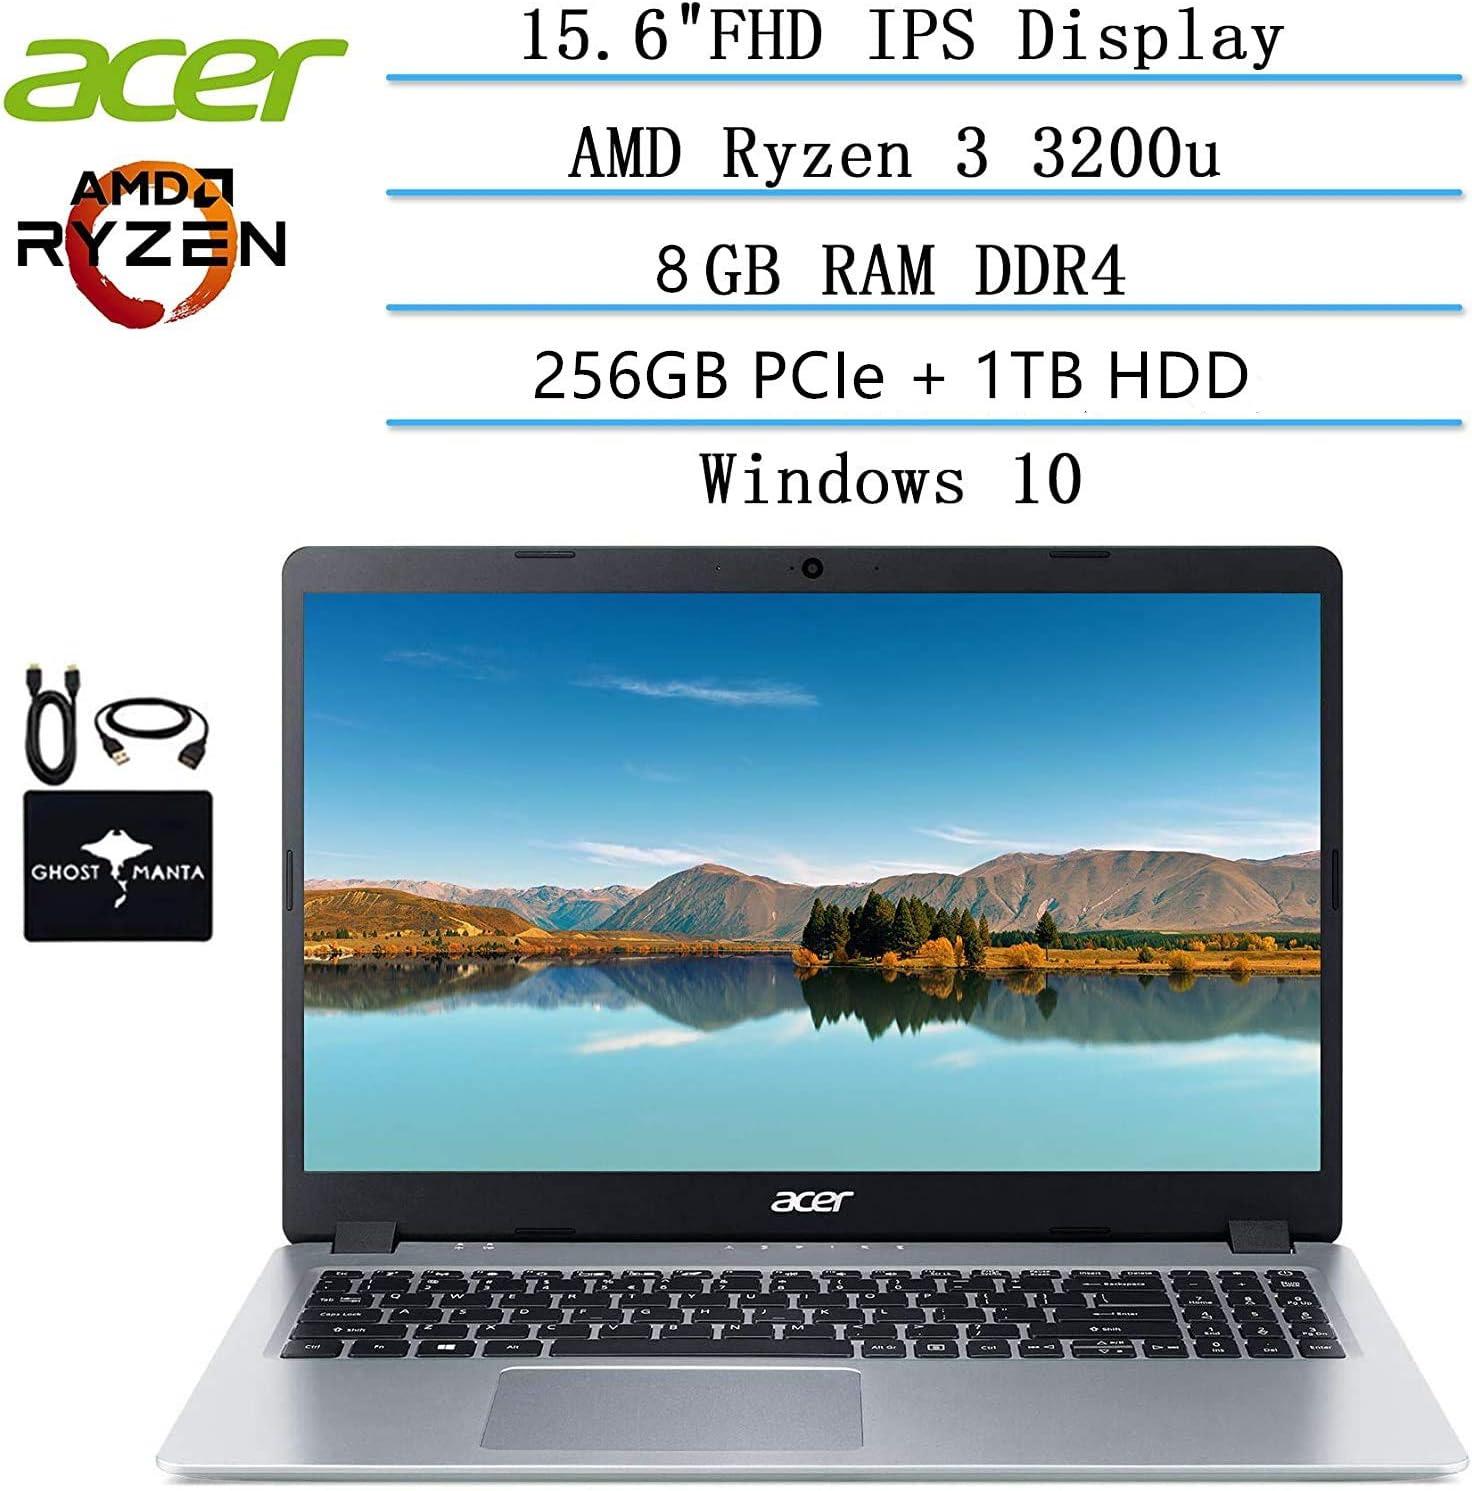 2020 Newest Acer Aspire 5 Slim Laptop 15.6 FHD IPS Display, AMD Ryzen 3 3200u-Dual Core (up to 3.5GHz), Vega 3 Graphics, 8GB RAM DDR4, 256GB PCIe SSD+1TB HDD, Windows 10 HDMI w/Ghost Manta accessories